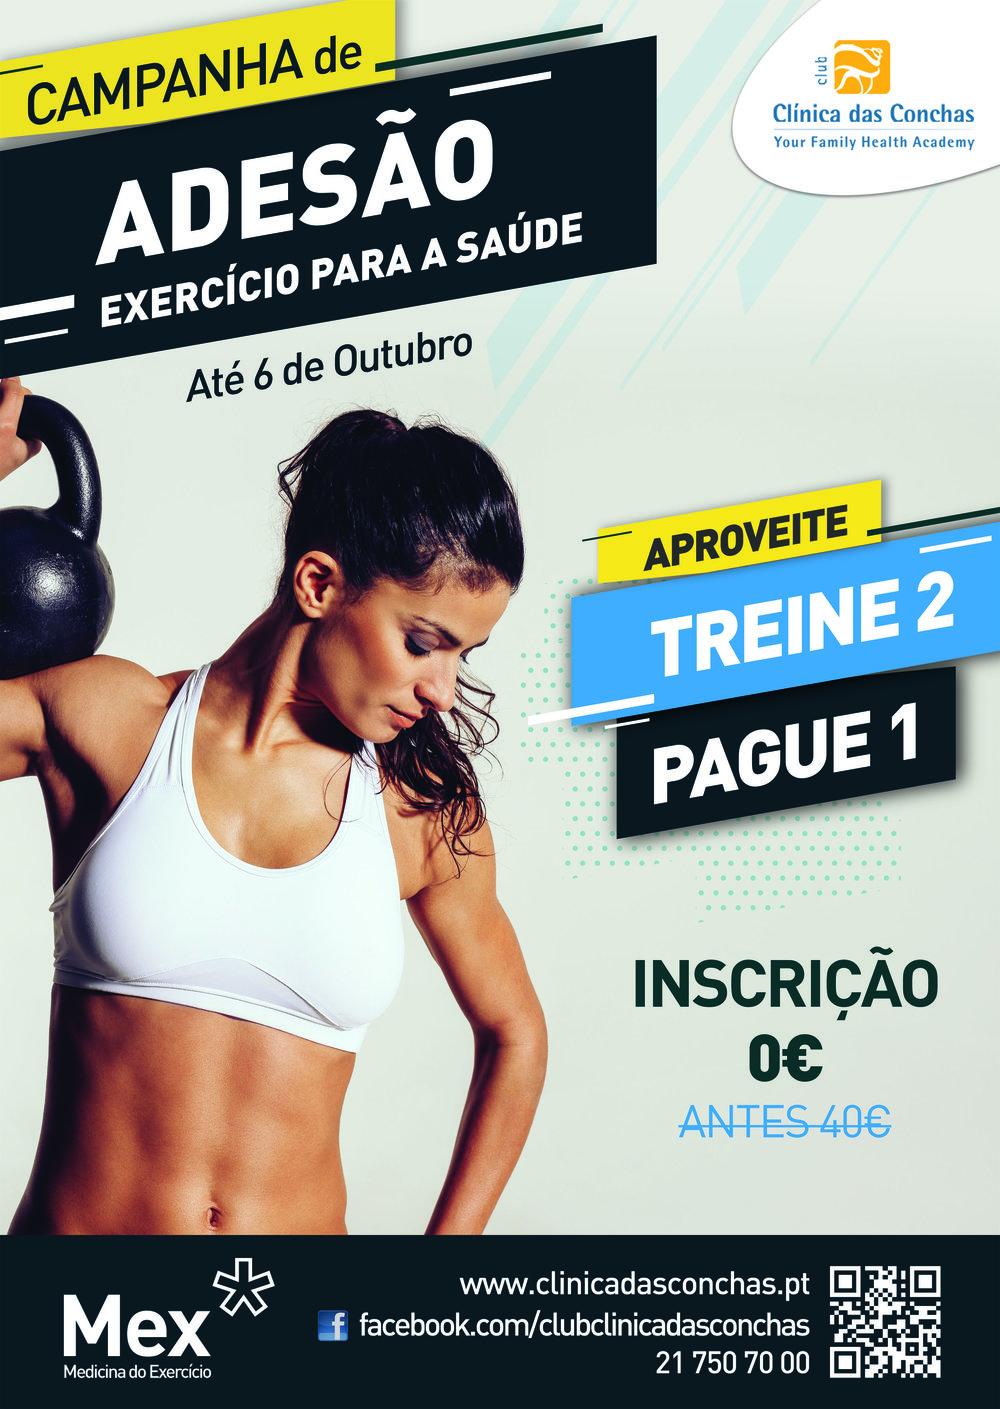 Poster A2 Ceampanha adesao Set 2018 LQ.jpg